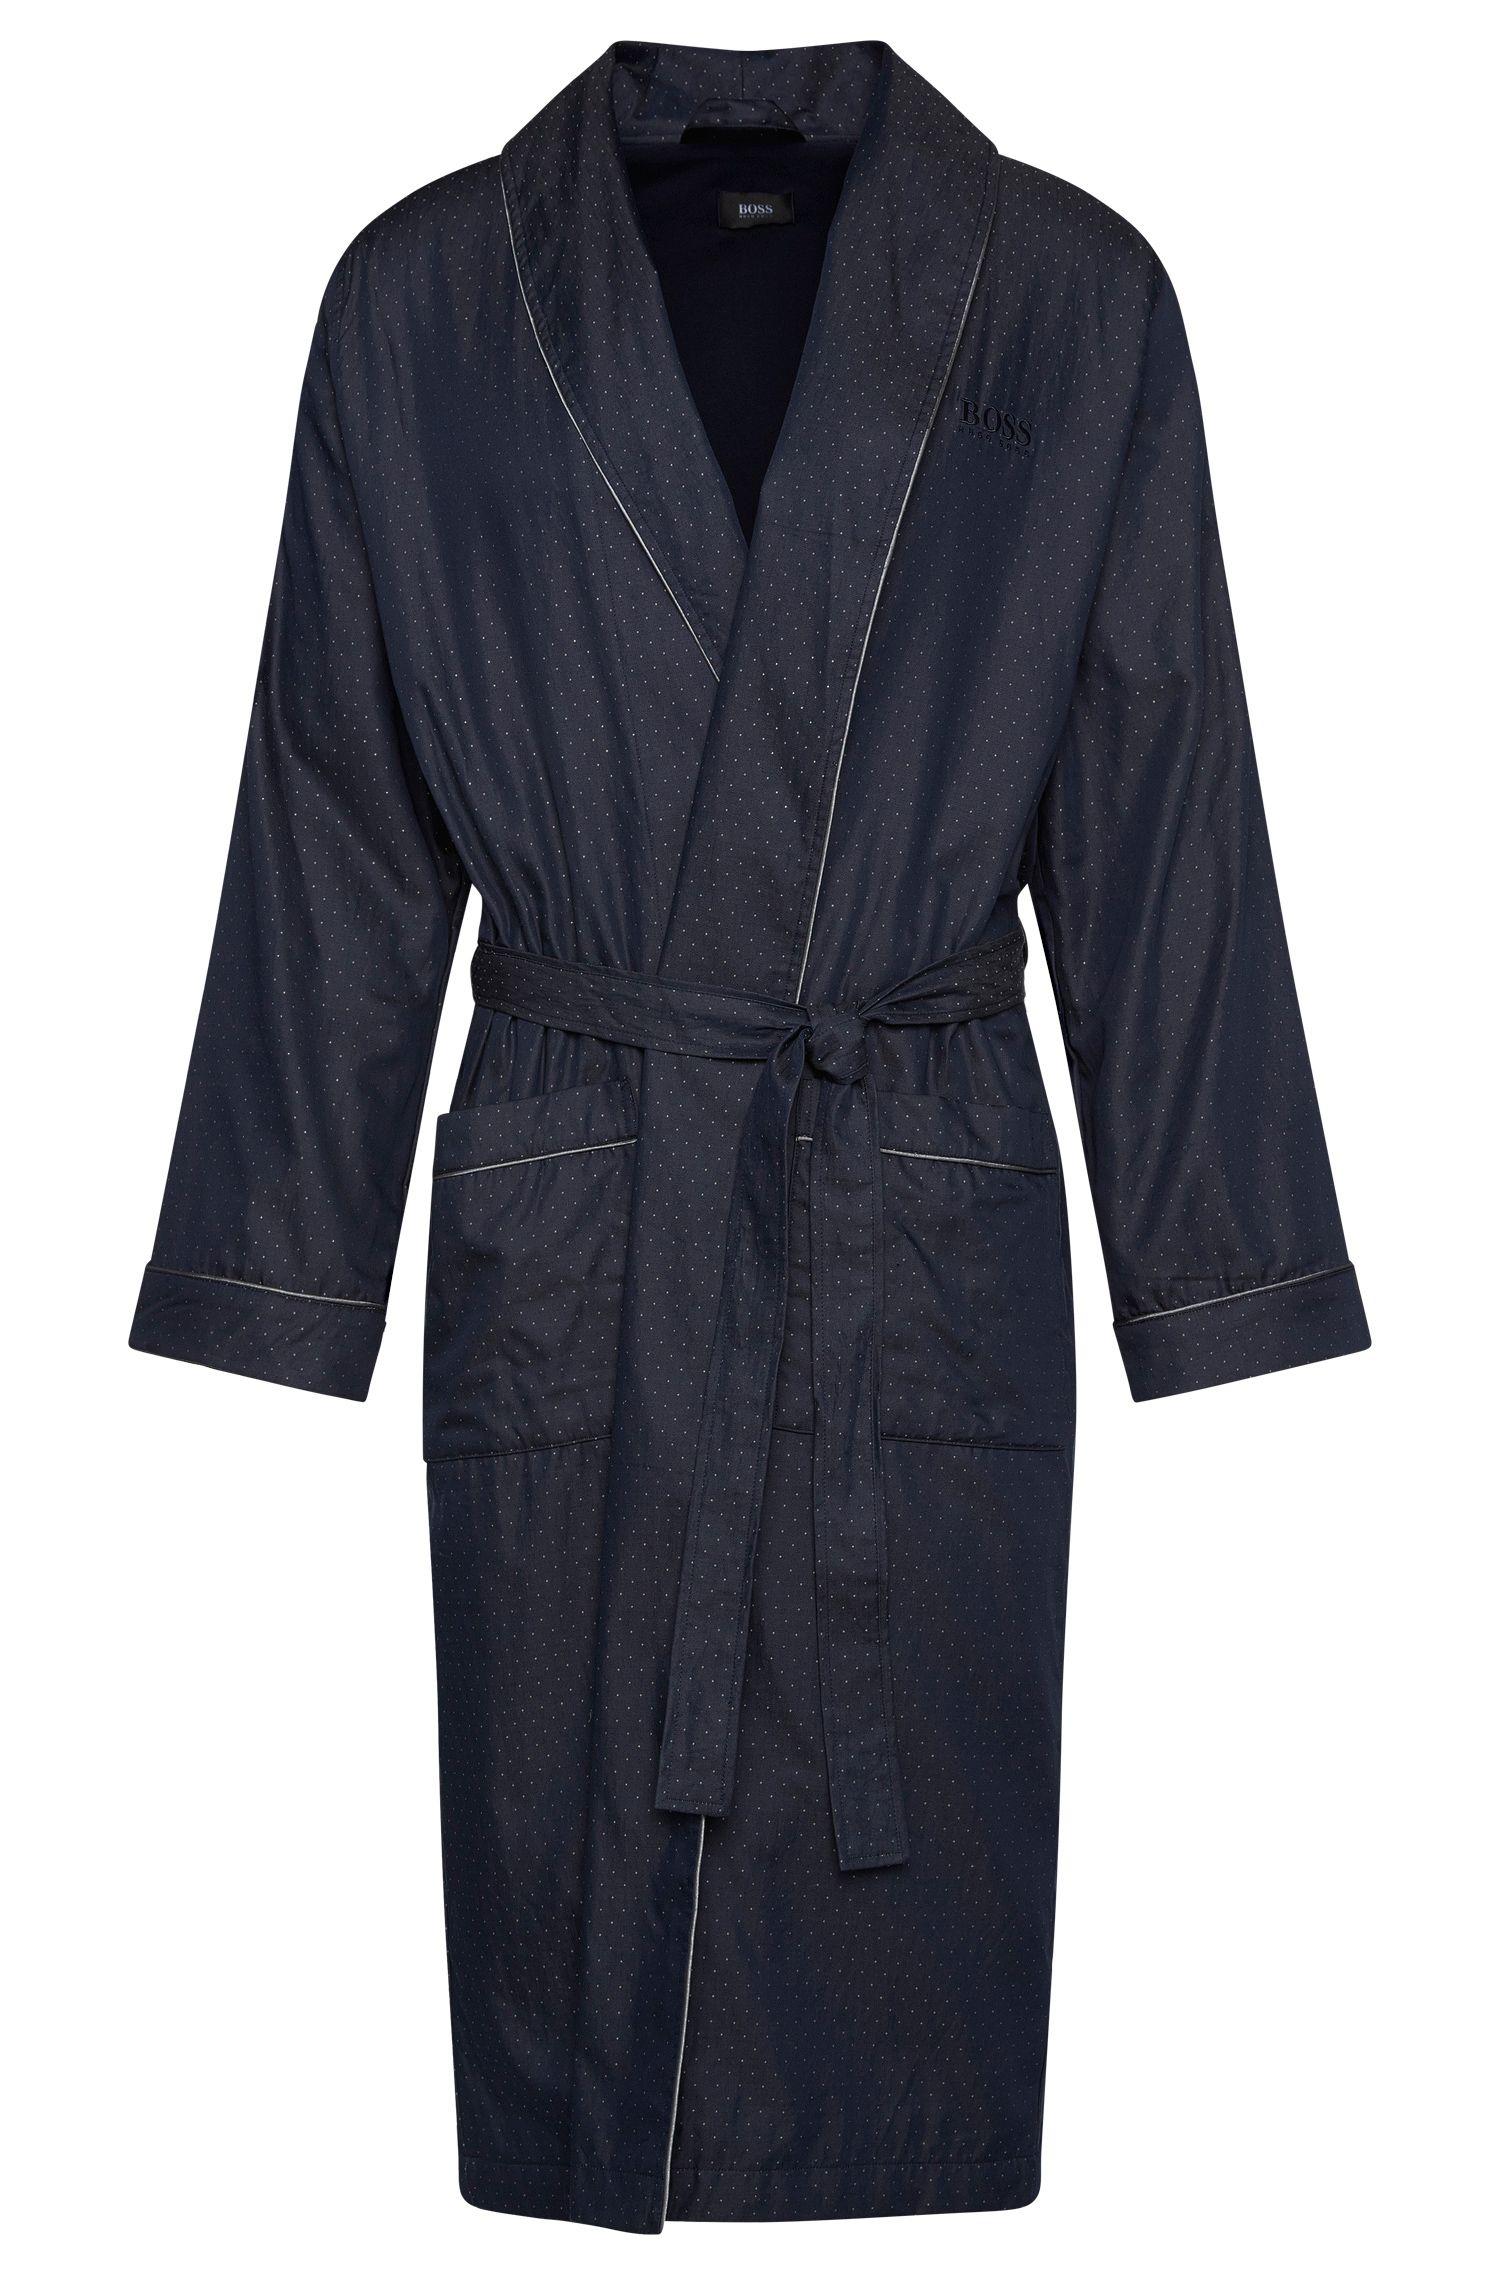 'Shawl Collar Robe' | Cotton Belted Robe